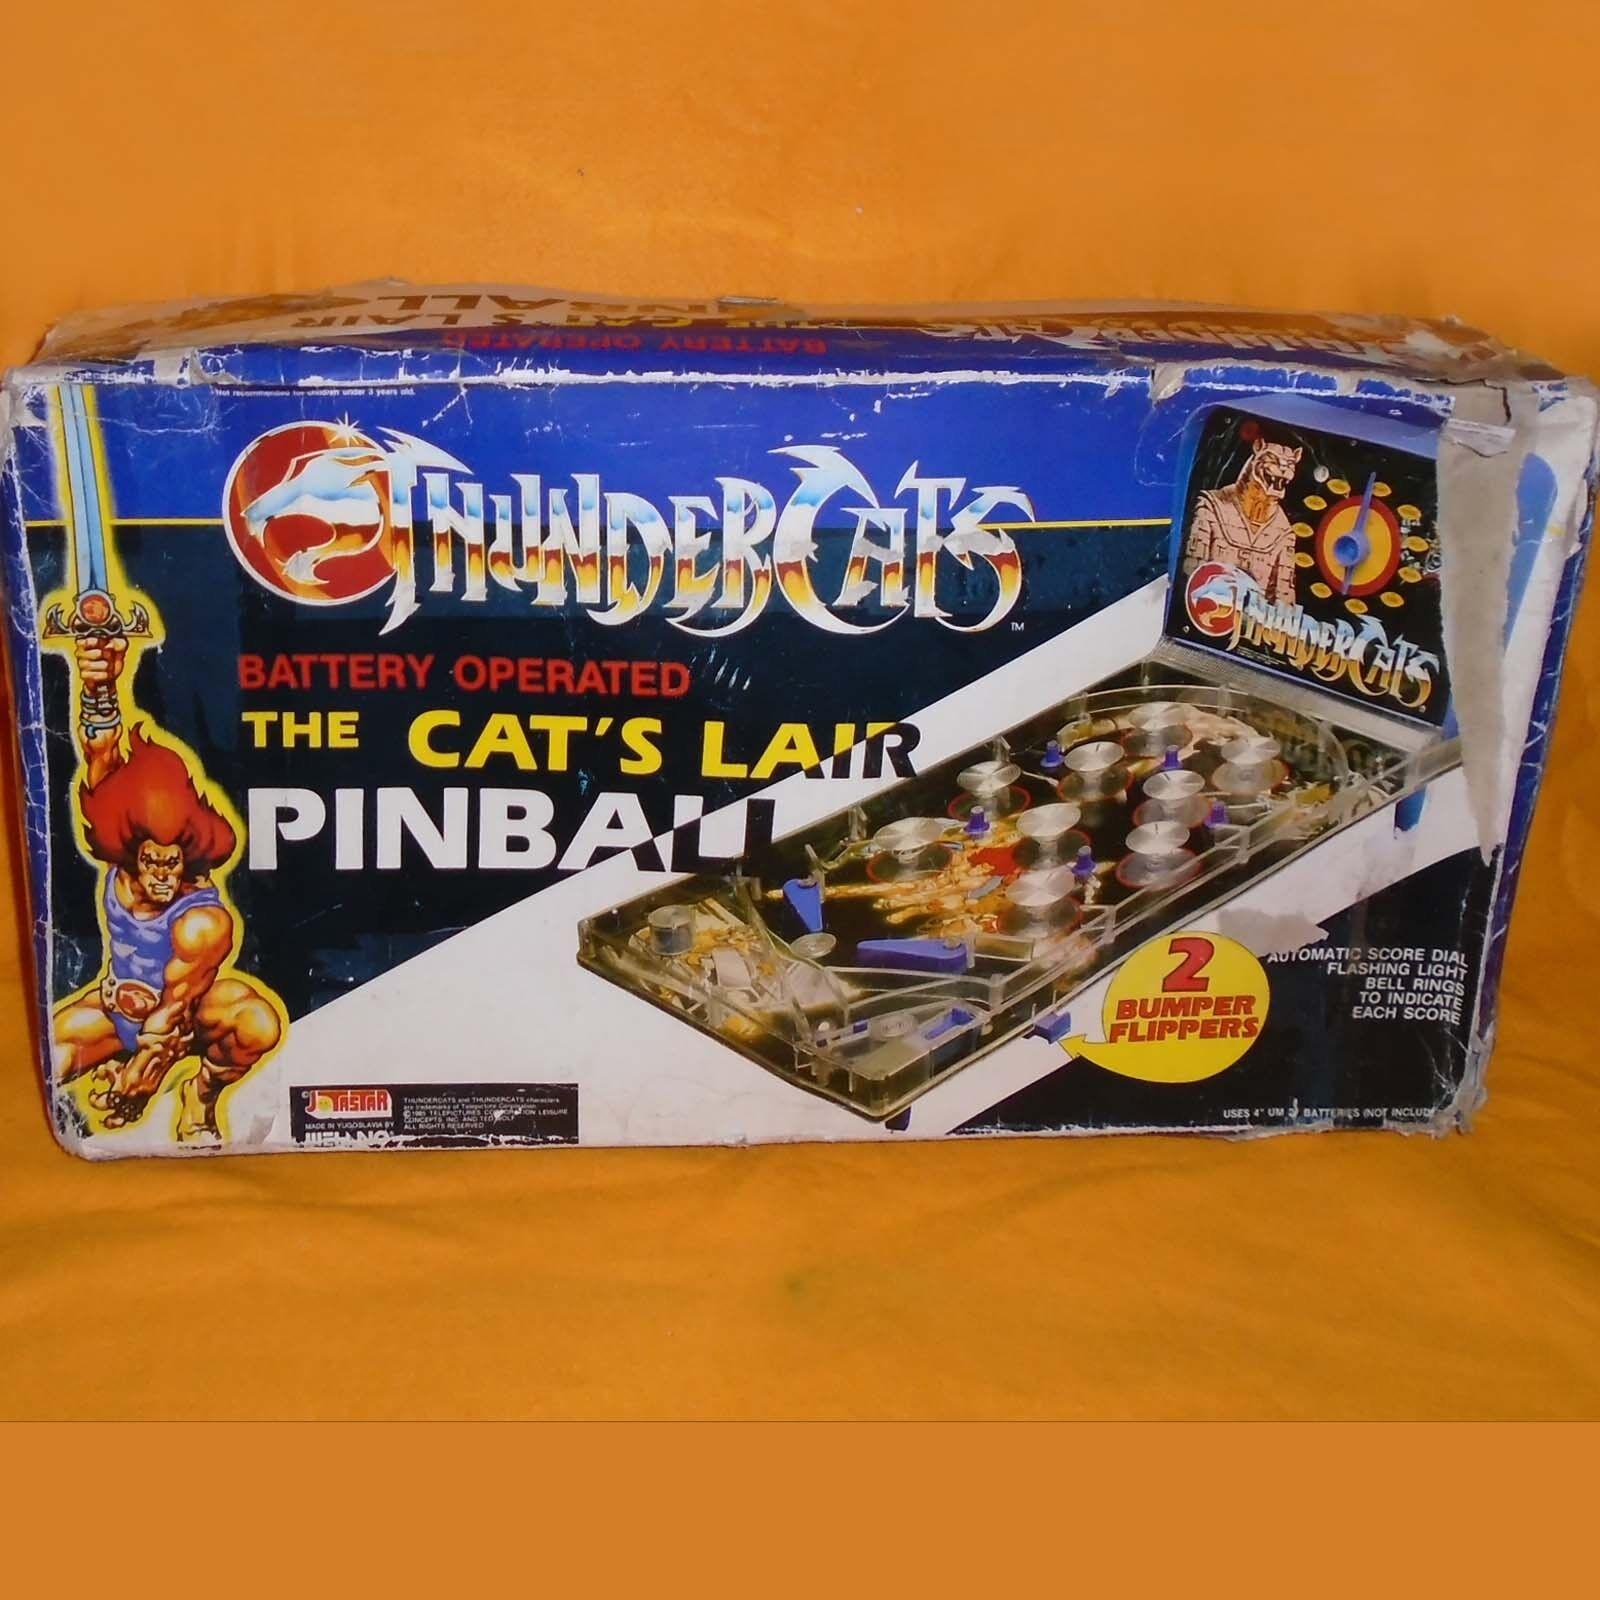 VINTAGE ANNI'80 Thundercats Cat's Nascondiglio FLIPPER GAME BOXED